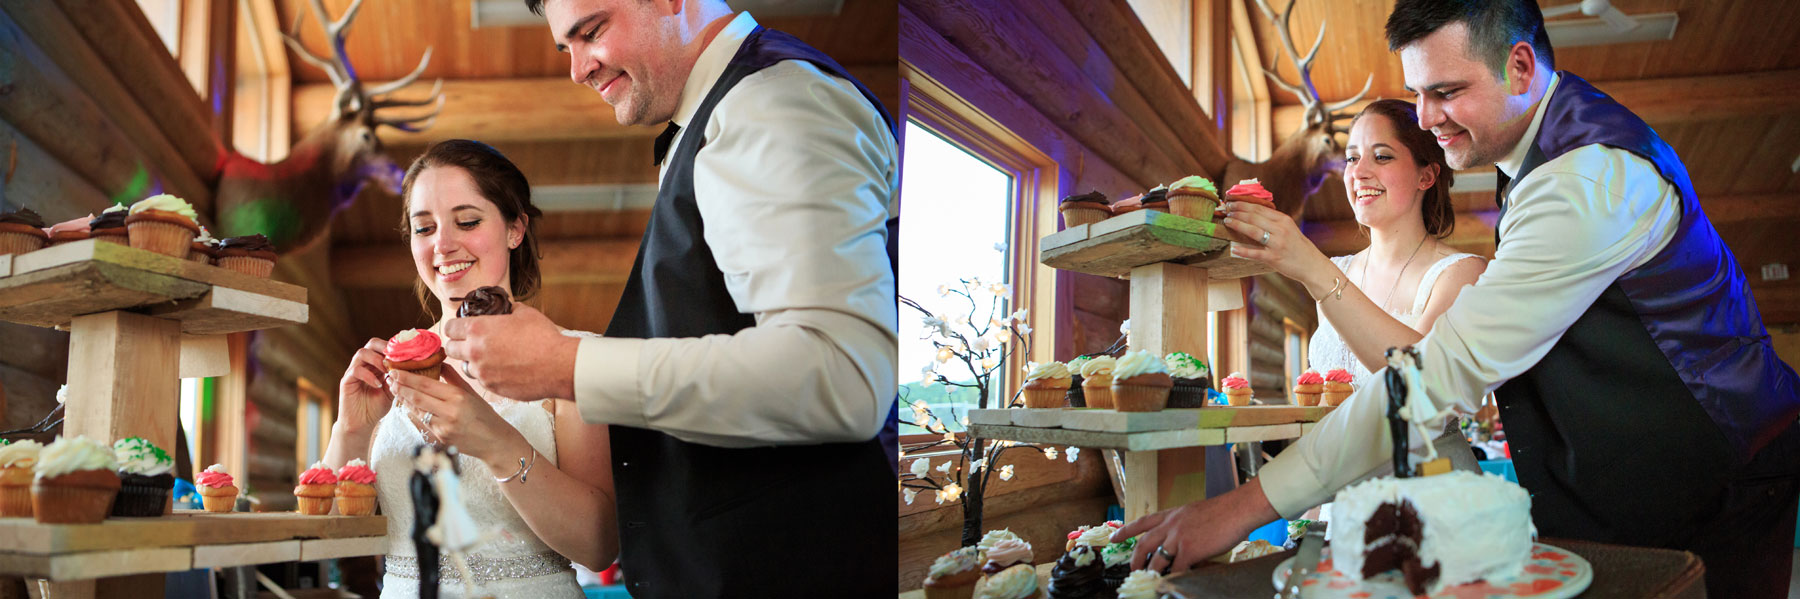 Angela & Patrick - Lacombe, Alberta Wedding Photography - Olson Studios (24)